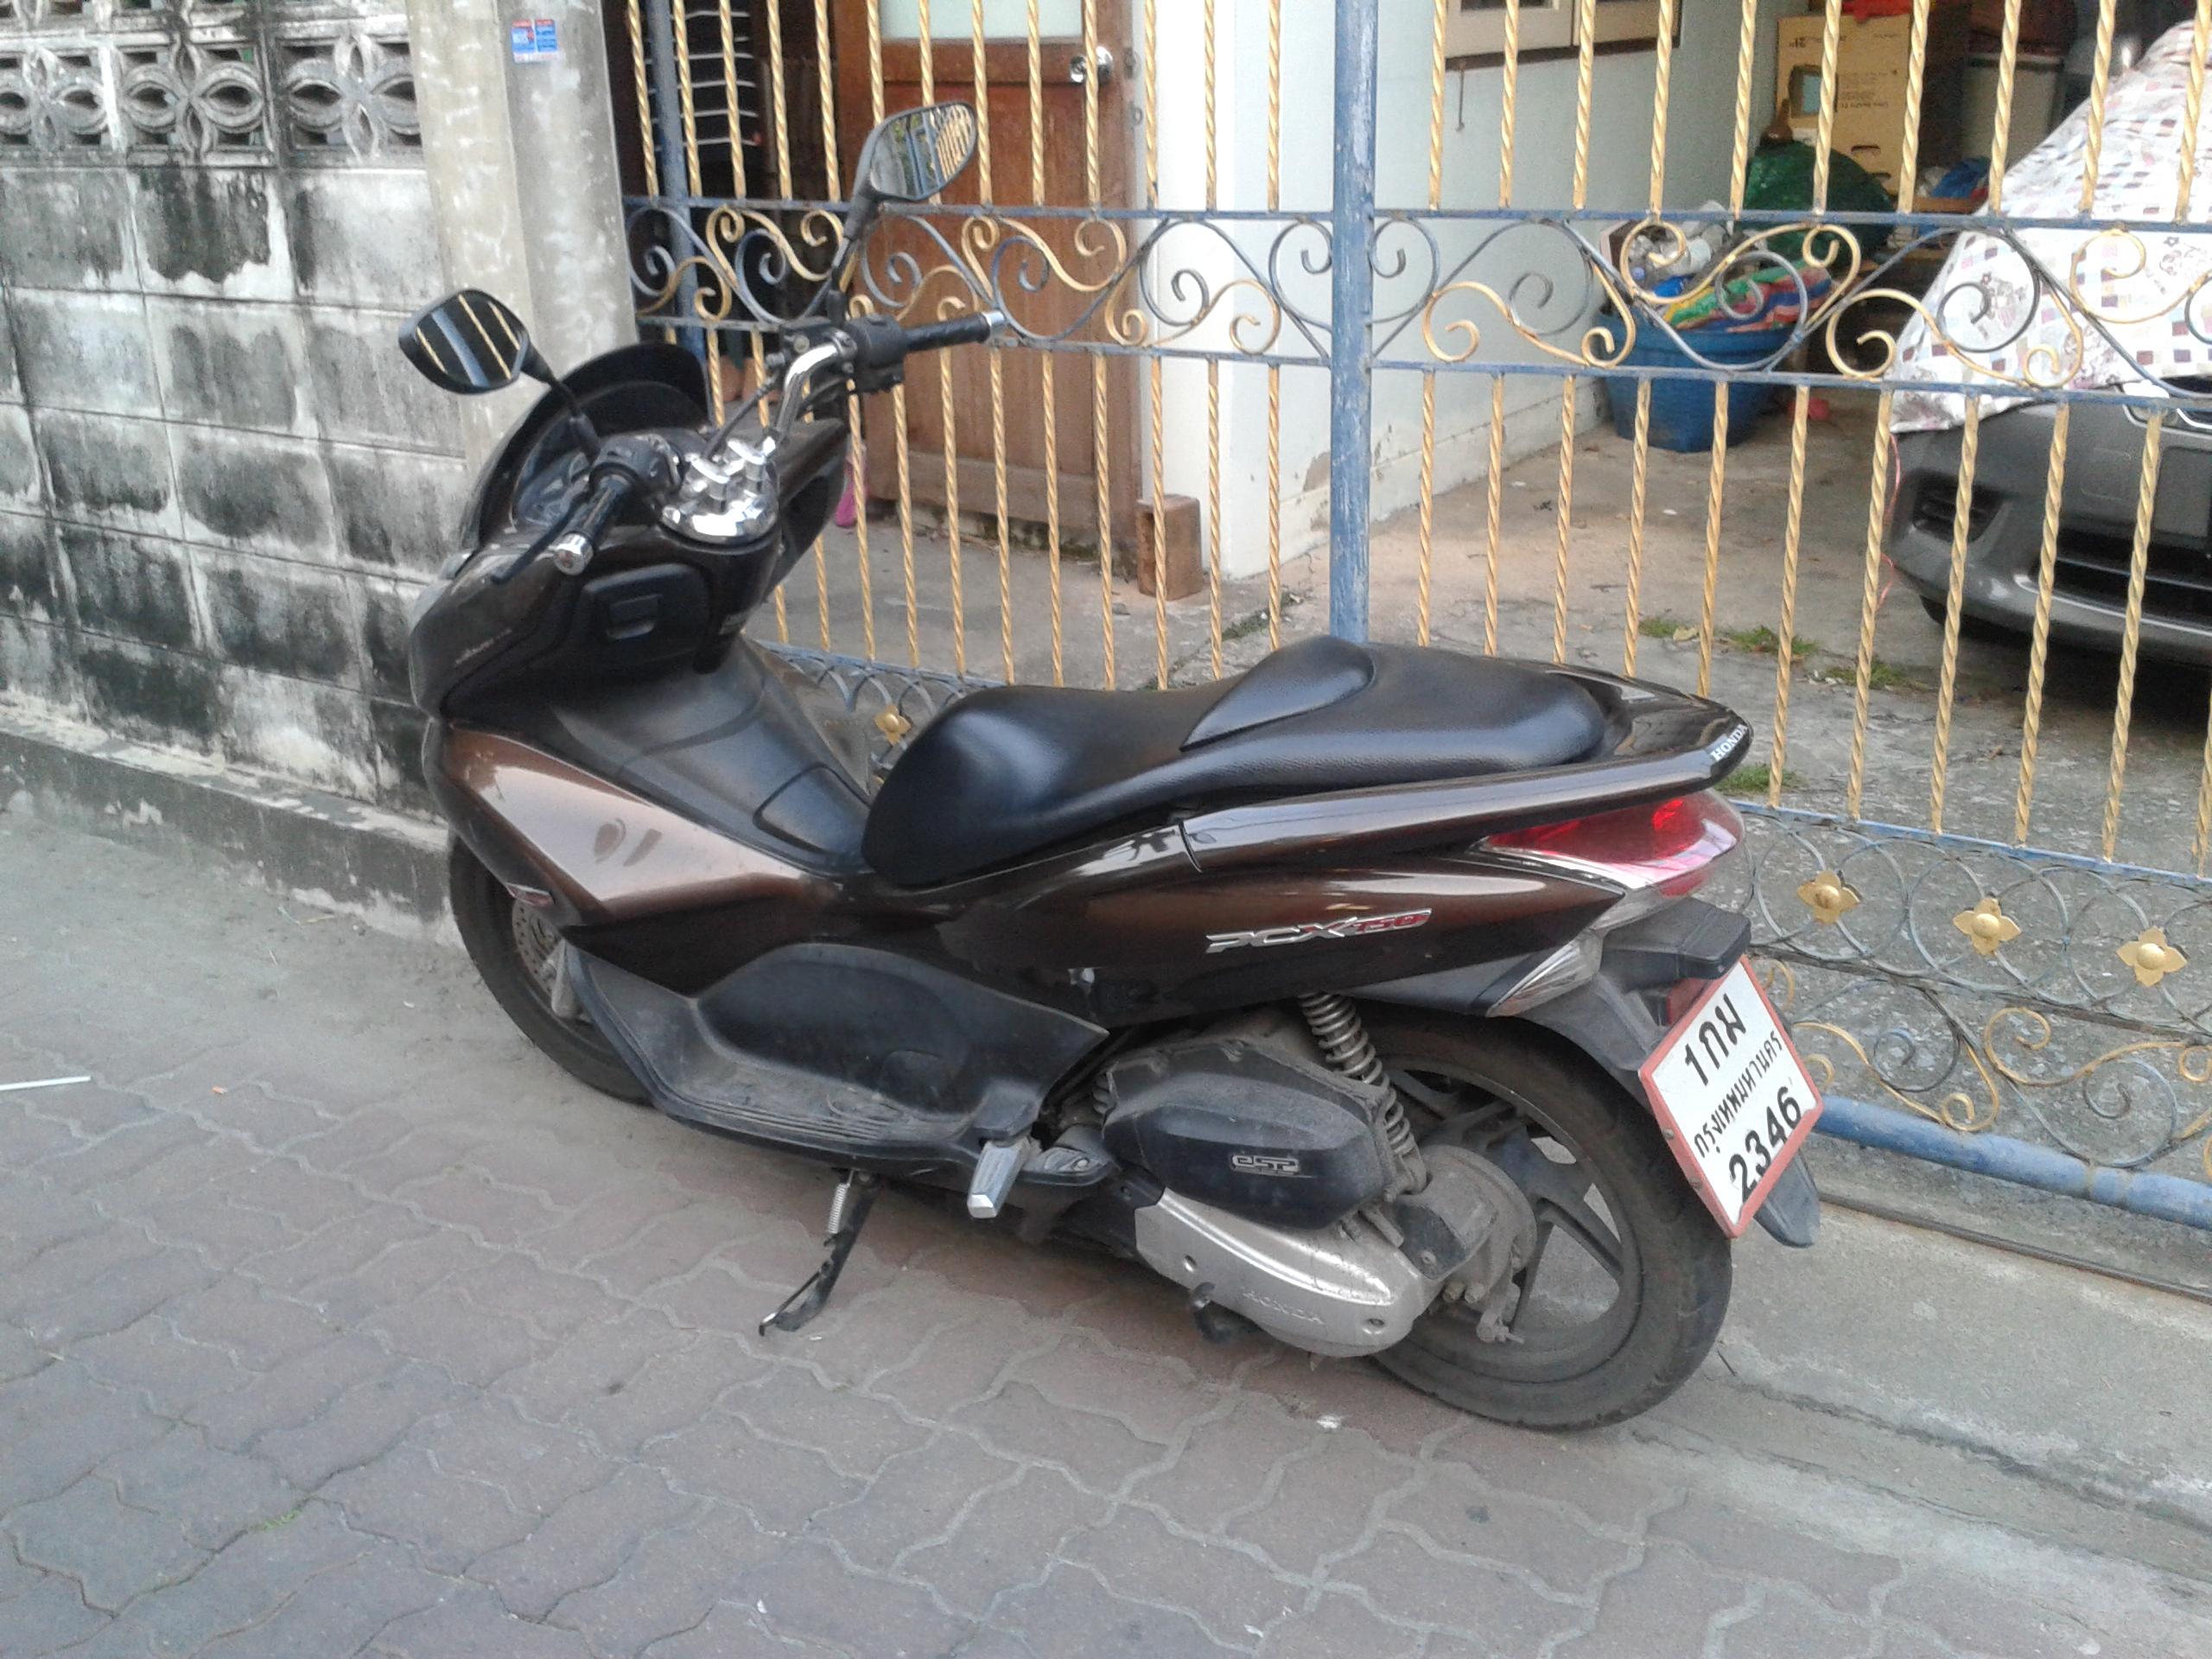 scooter listings motorcycles pcx patagonia honda